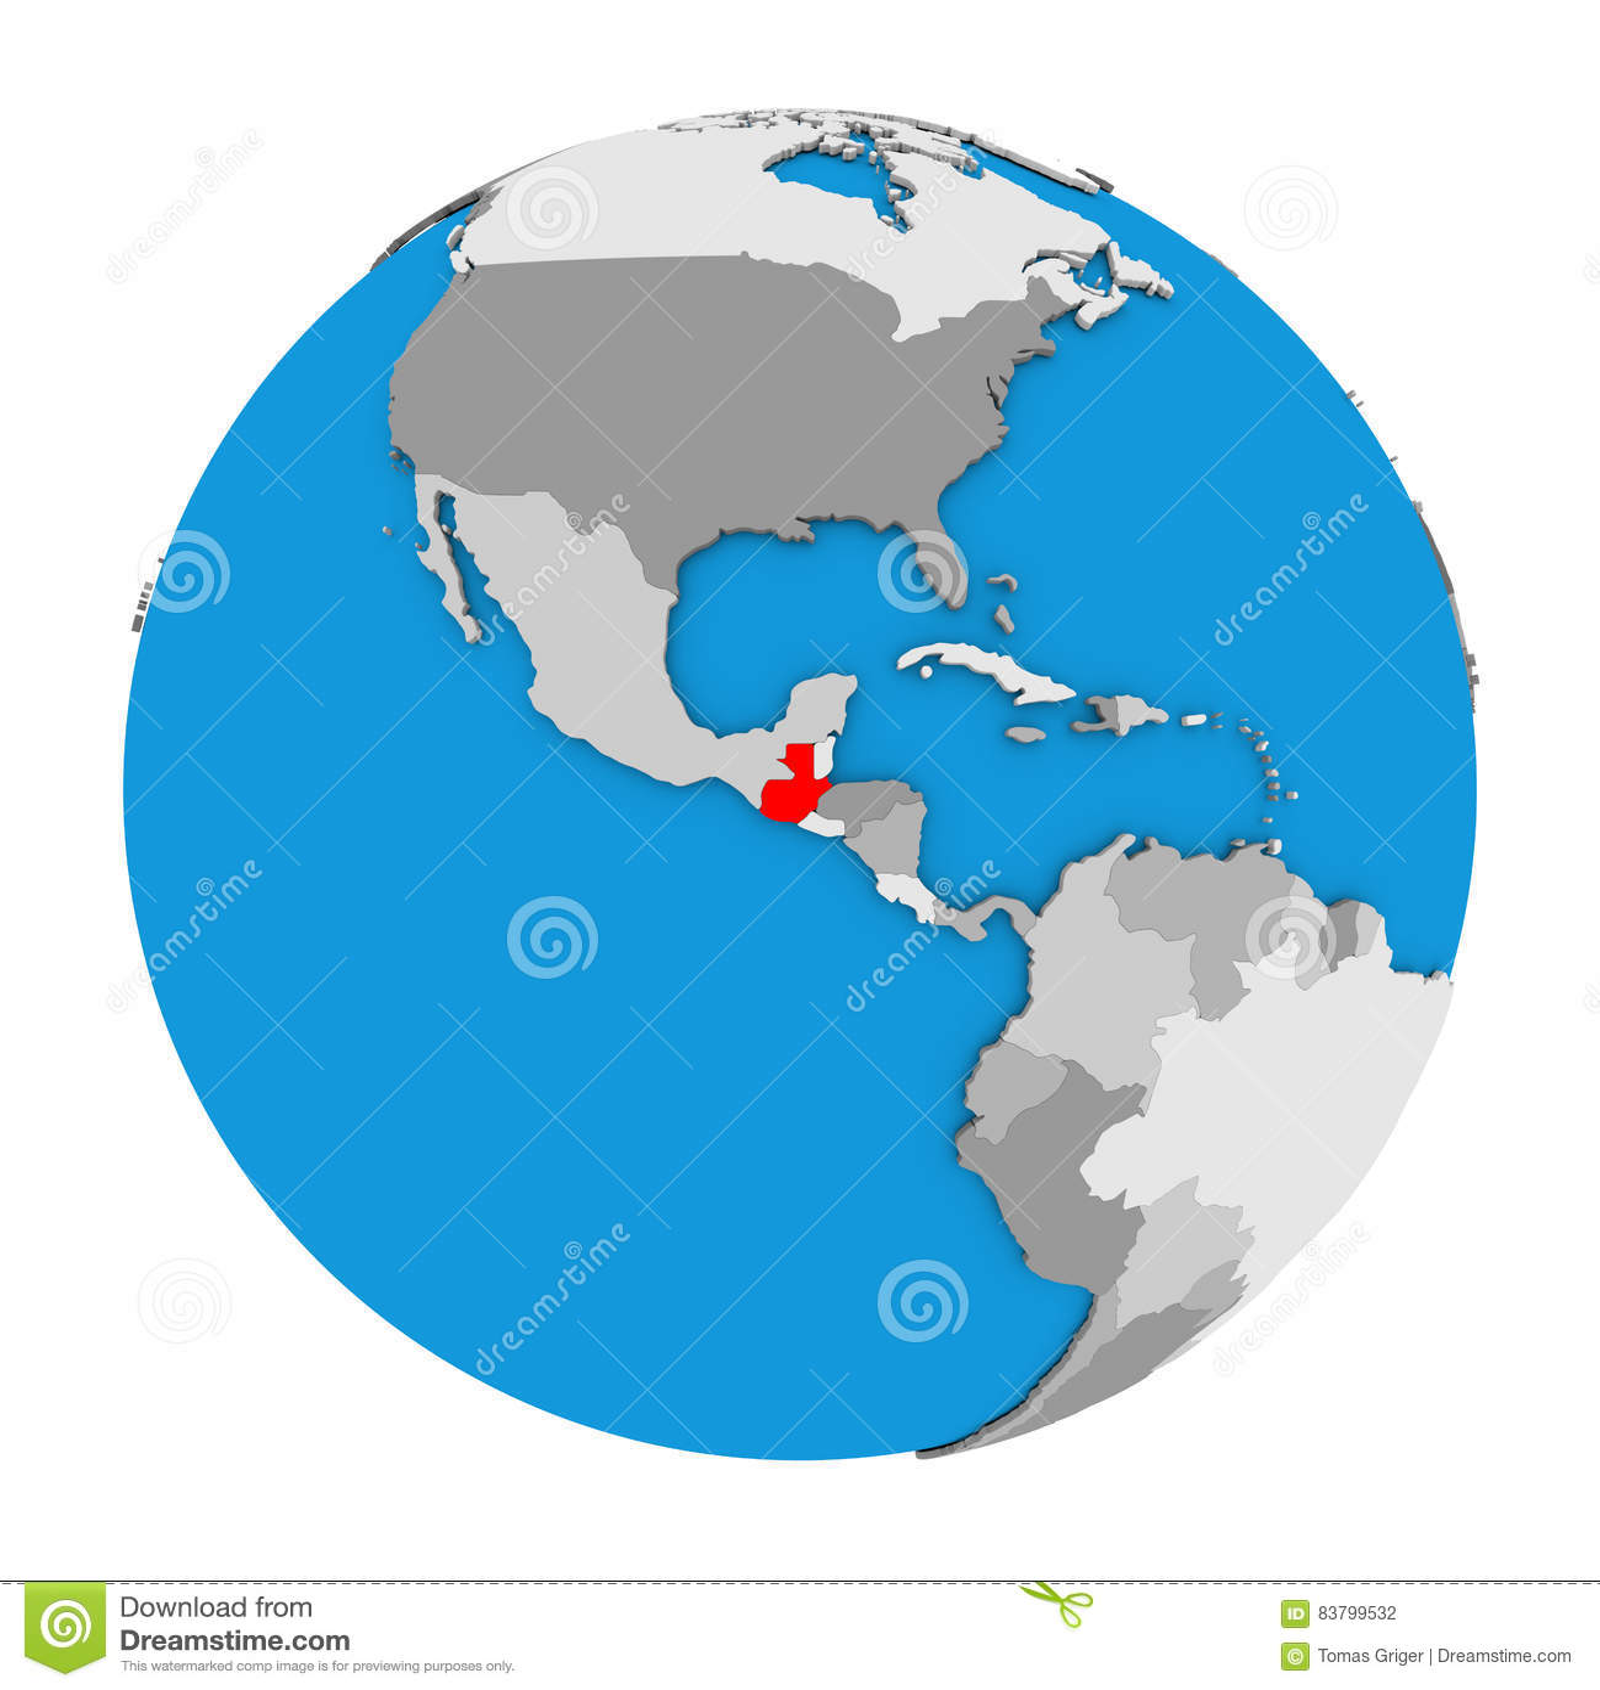 Guatemala on globe stock illustration. Illustration of south - 83799532